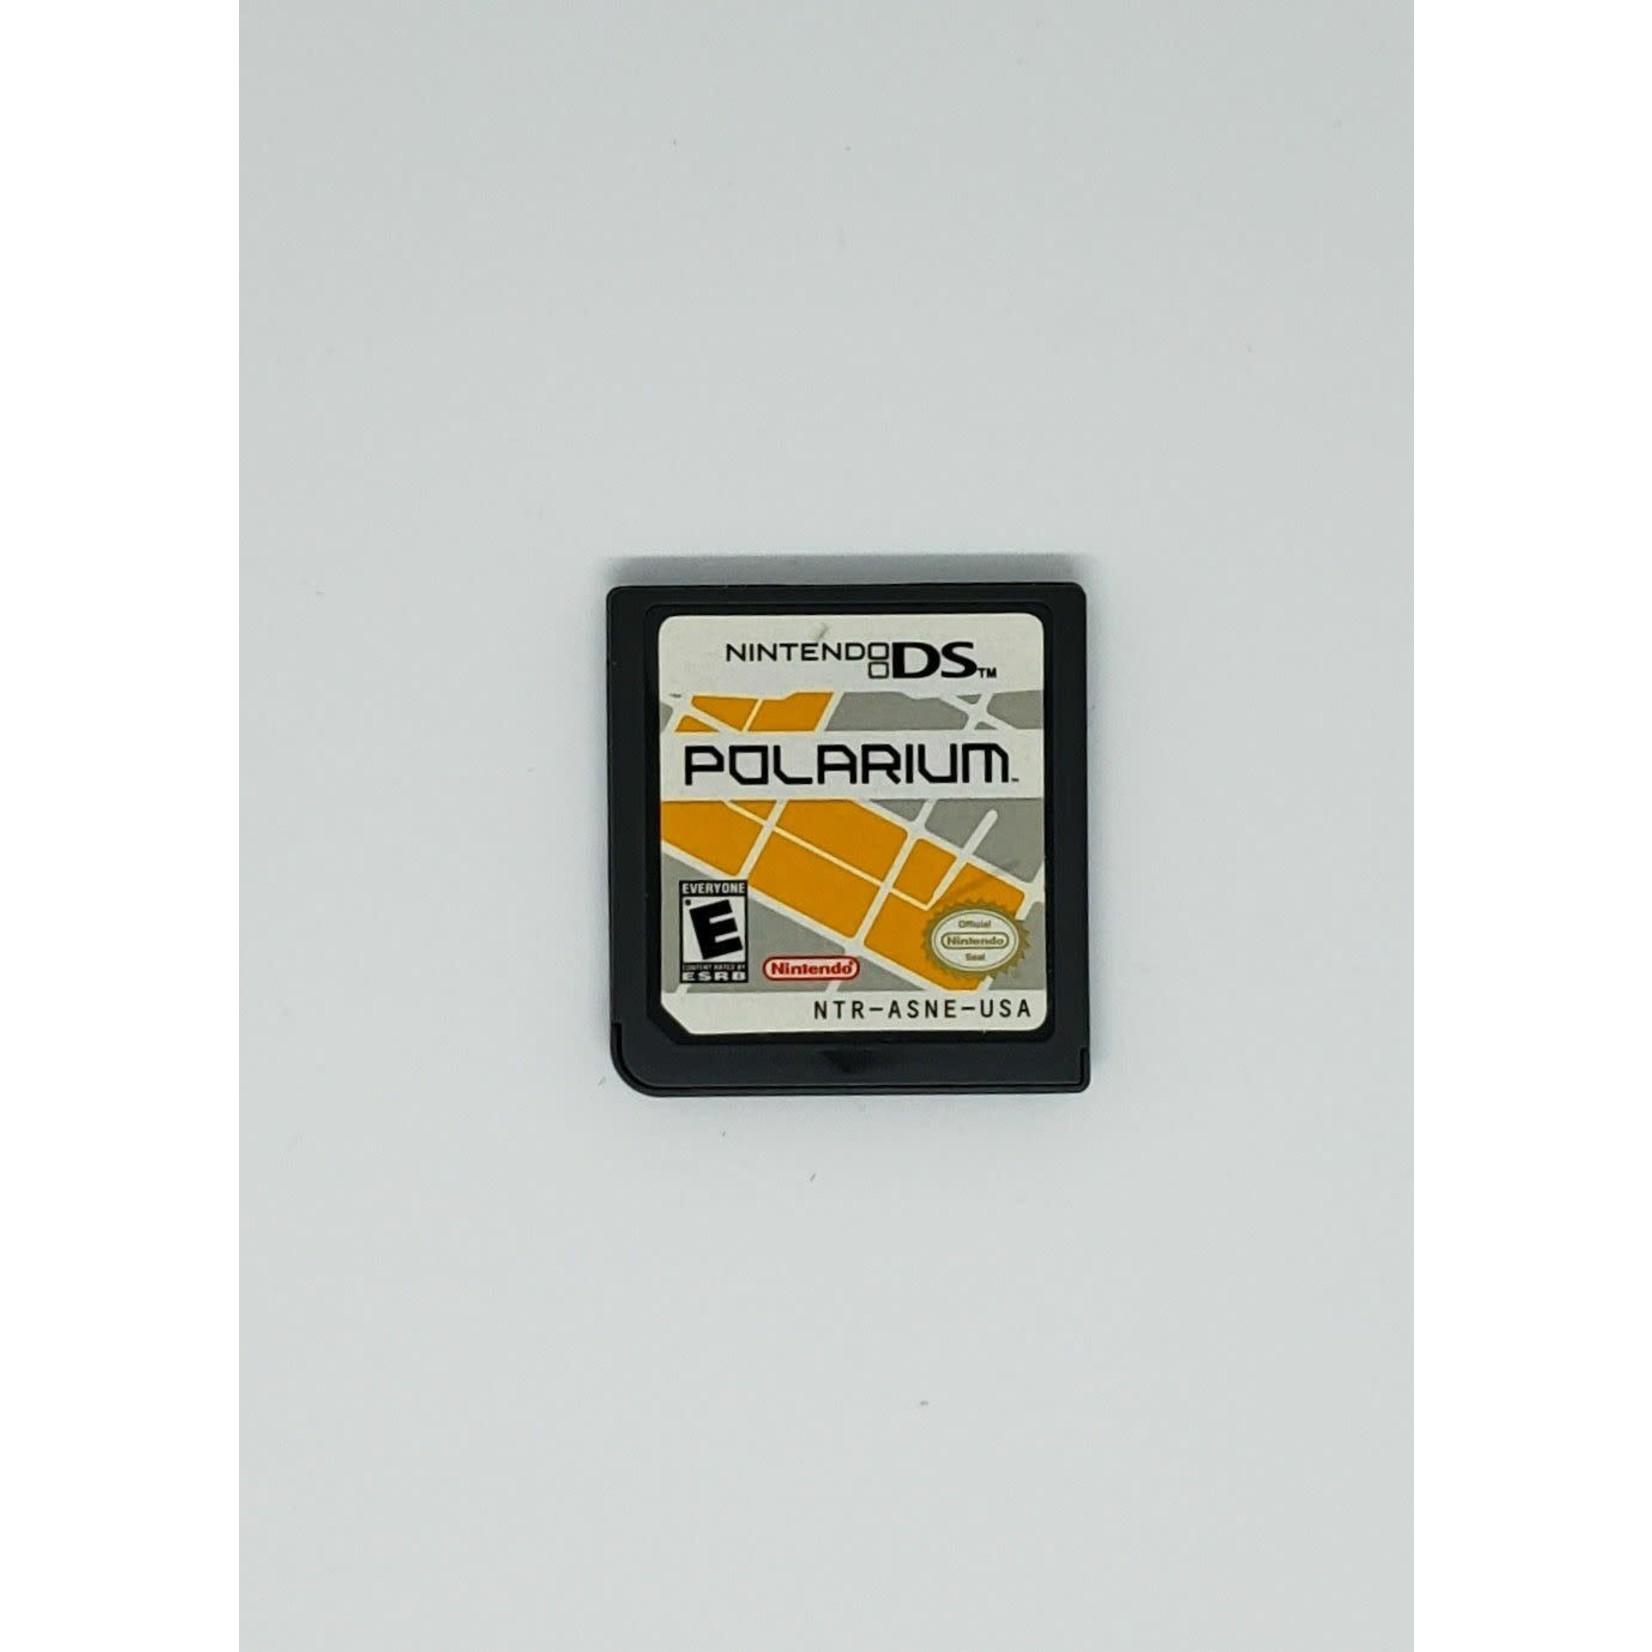 DSu-Polarium (chip only)